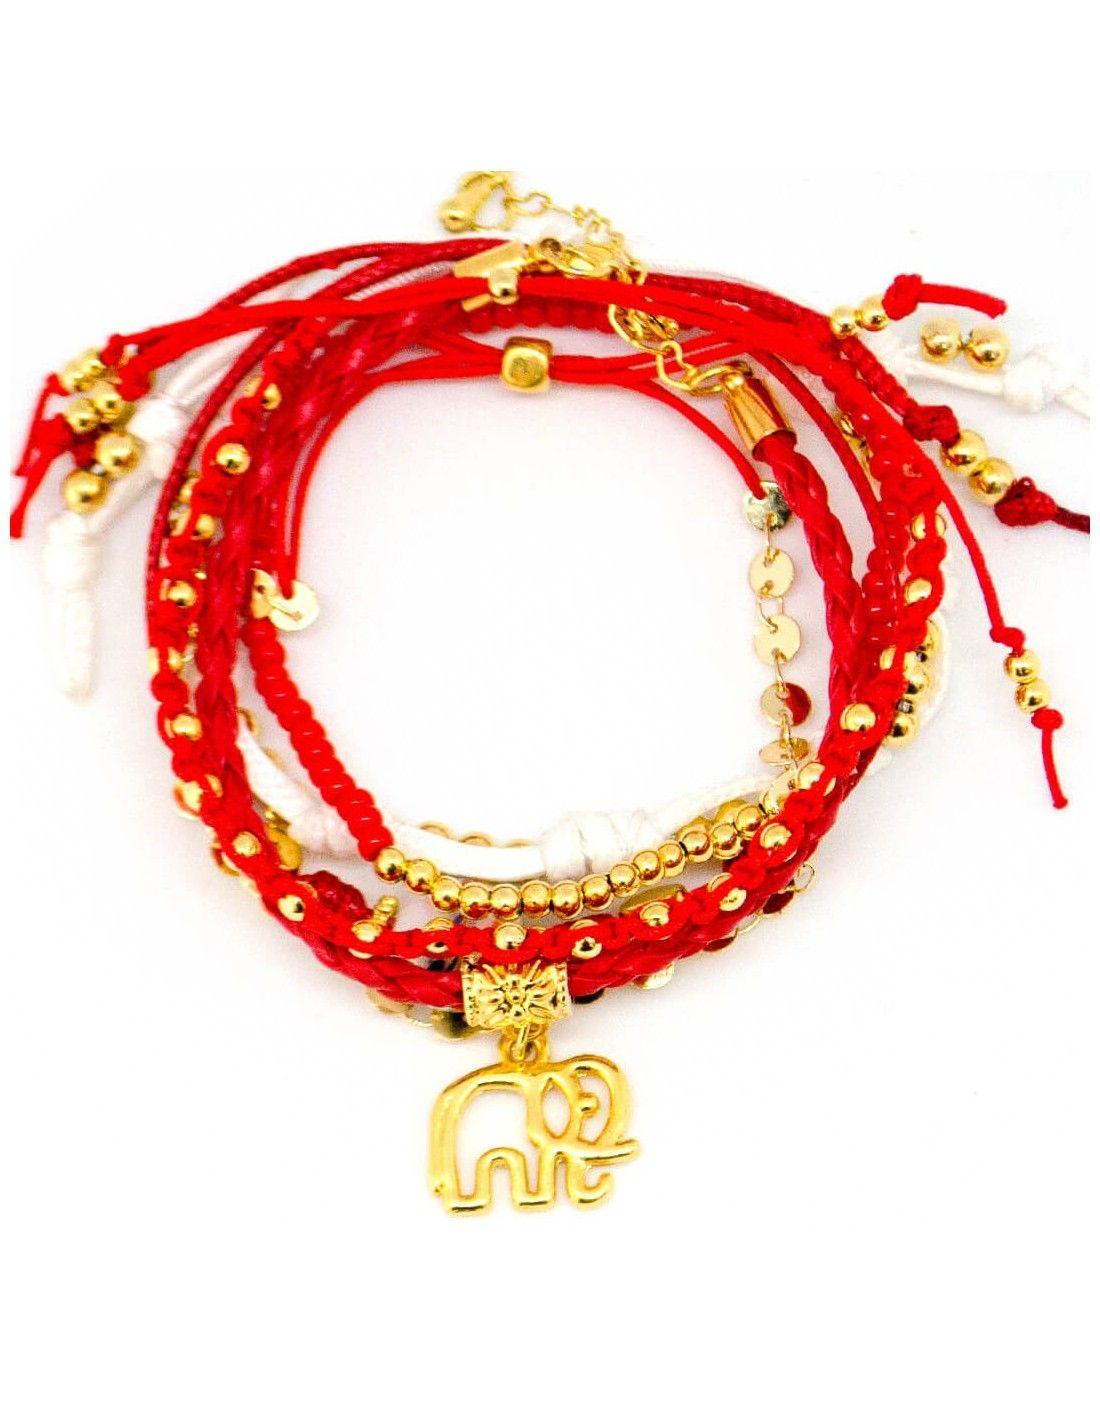 e771f5216d0a Set de 6 pulseras para mujer ajustables con significado elefante que  simboliza caminos de prosperidad elaboradas